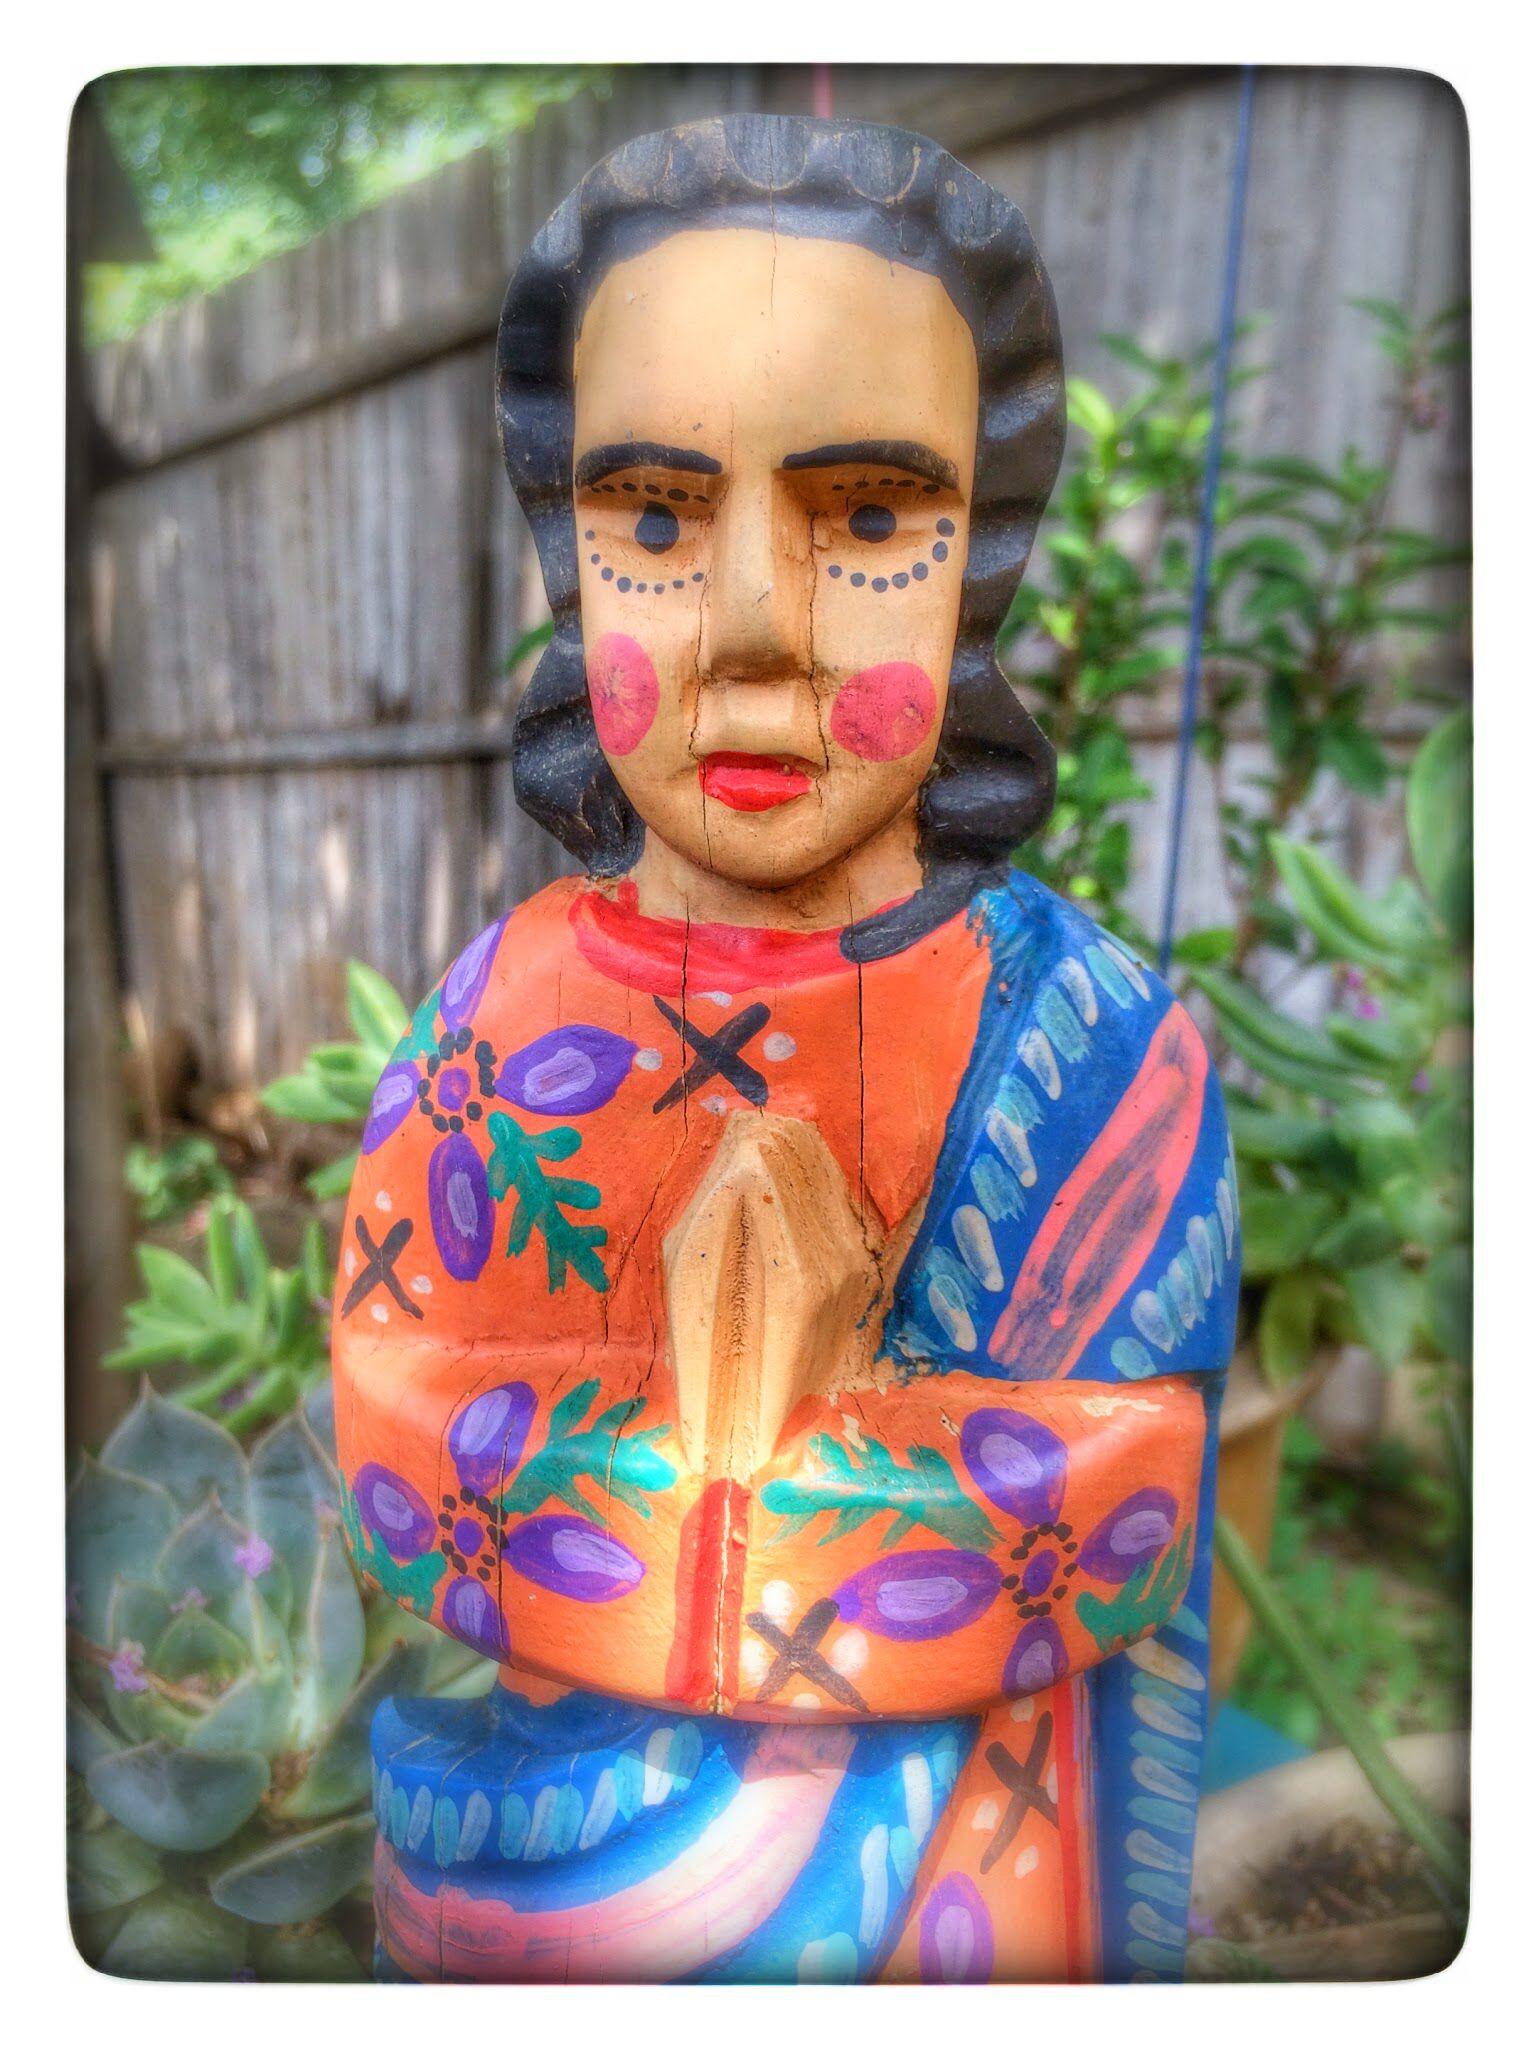 wooden art saint mexican imports santa fe new mexico backyard